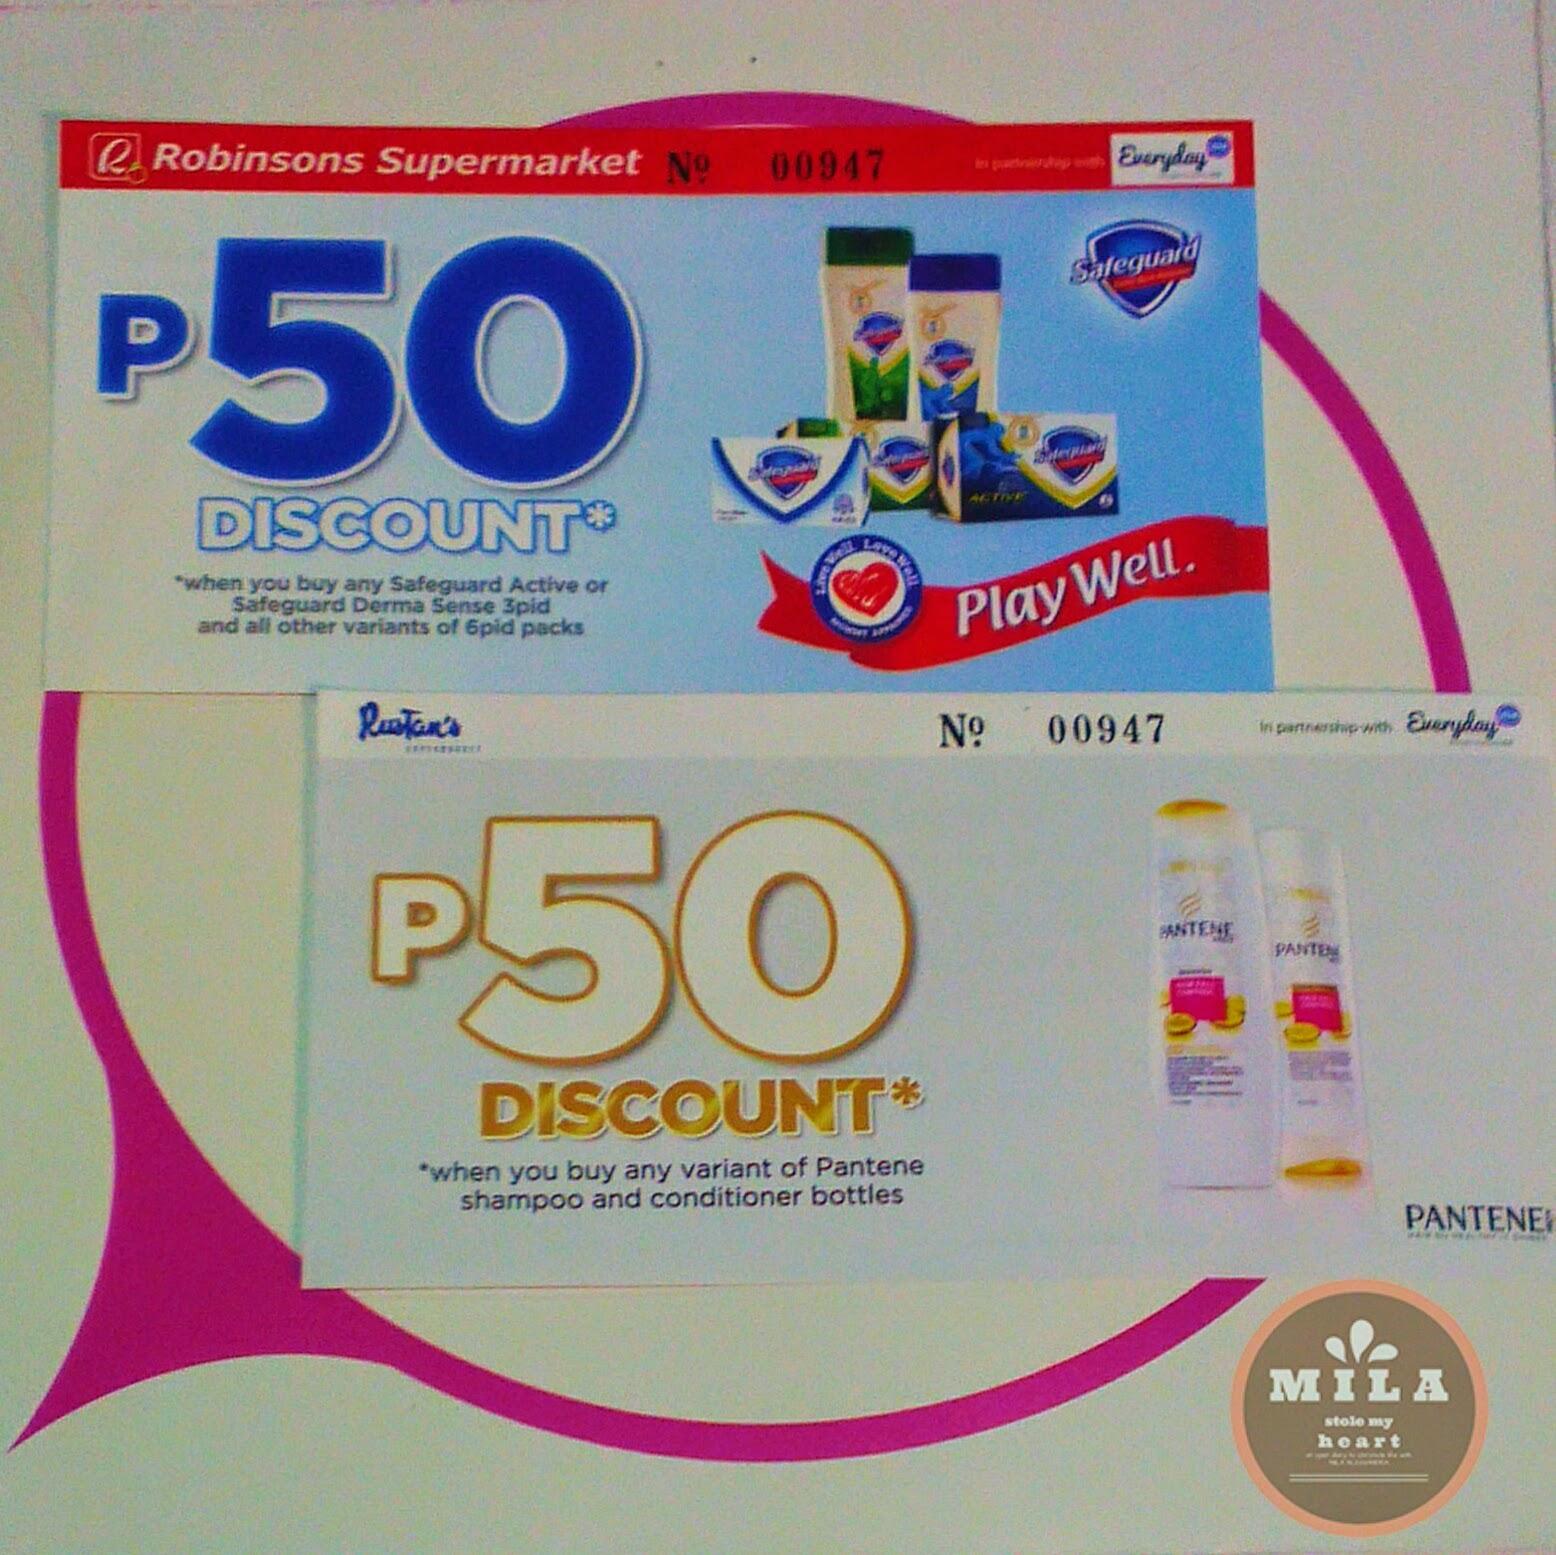 Safeguard and Pantene Discount Vouchers